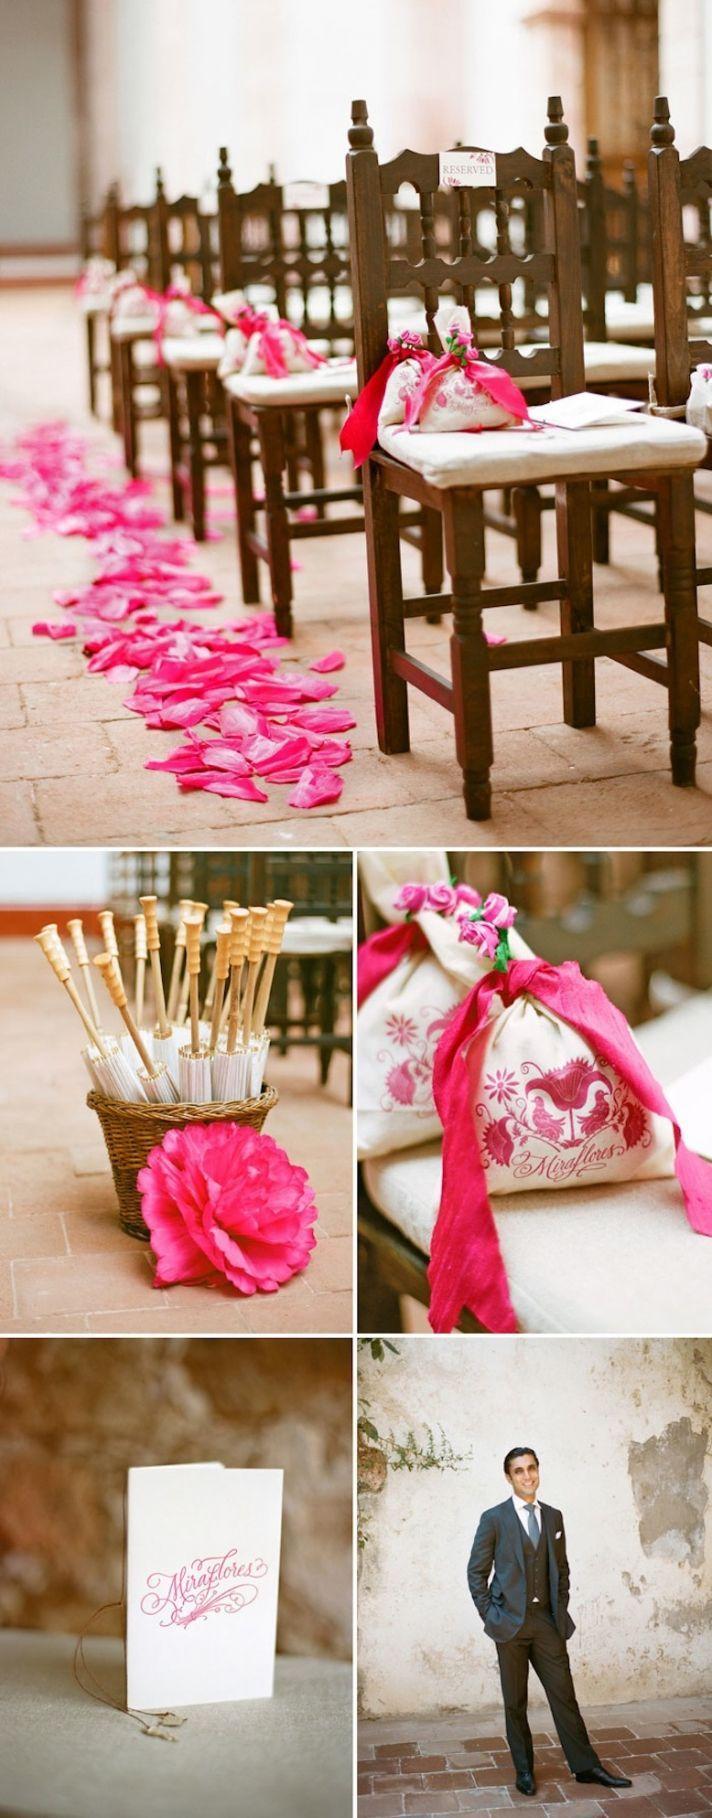 53 best Wedding Ceremonies images on Pinterest | Weddings ...